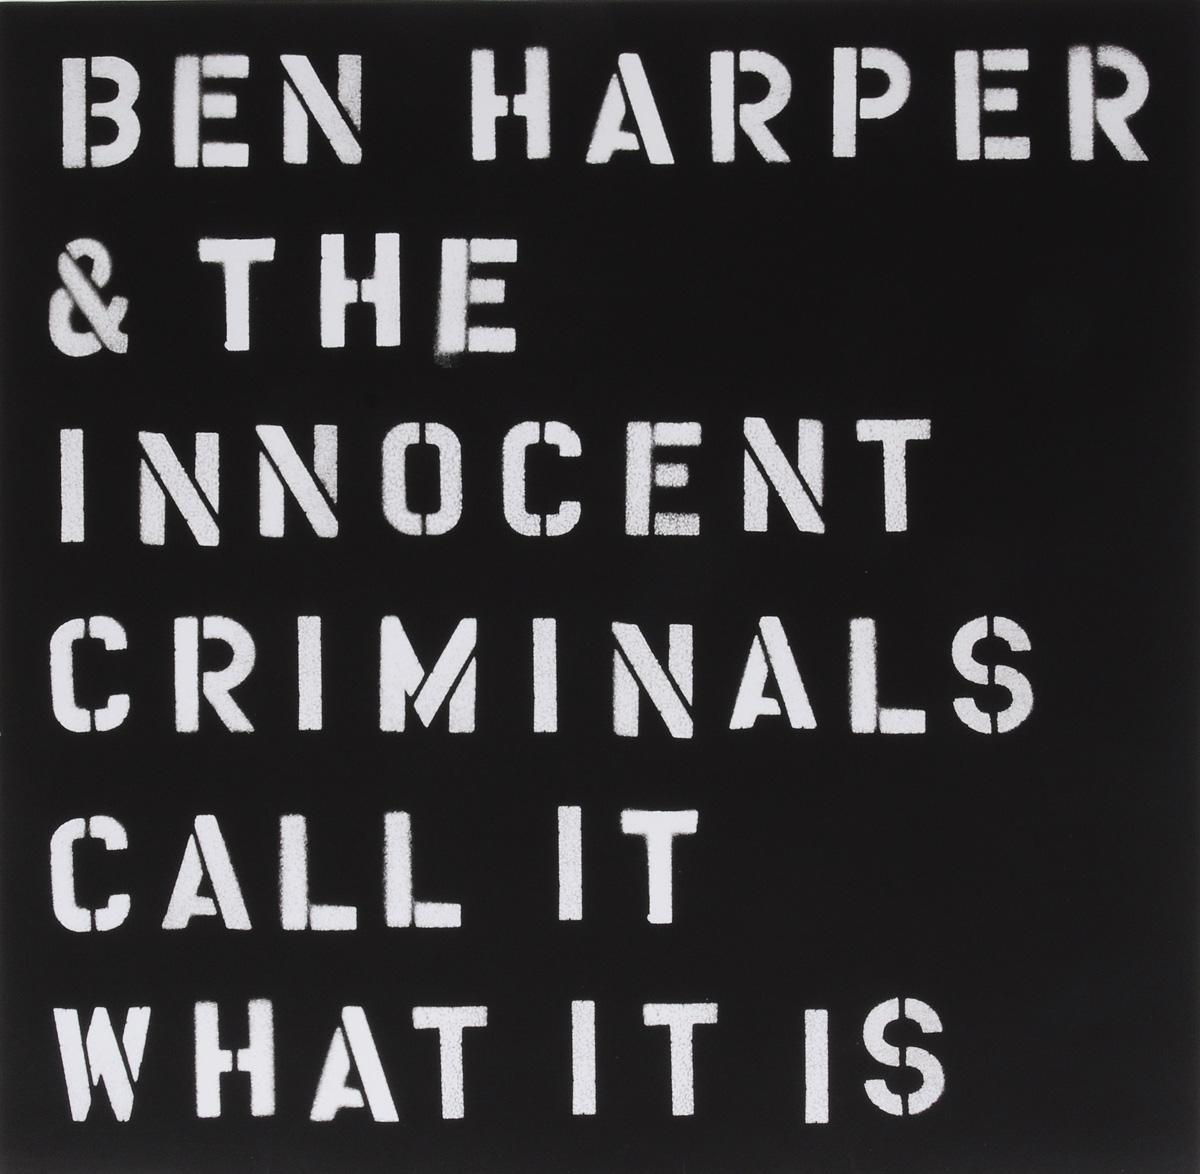 Бен Харпер,The Innocent Criminals Ben Harper & The Innocent Criminals. Call It What It Is (LP) ben harper ben harper welcome to the cruel world lp 7